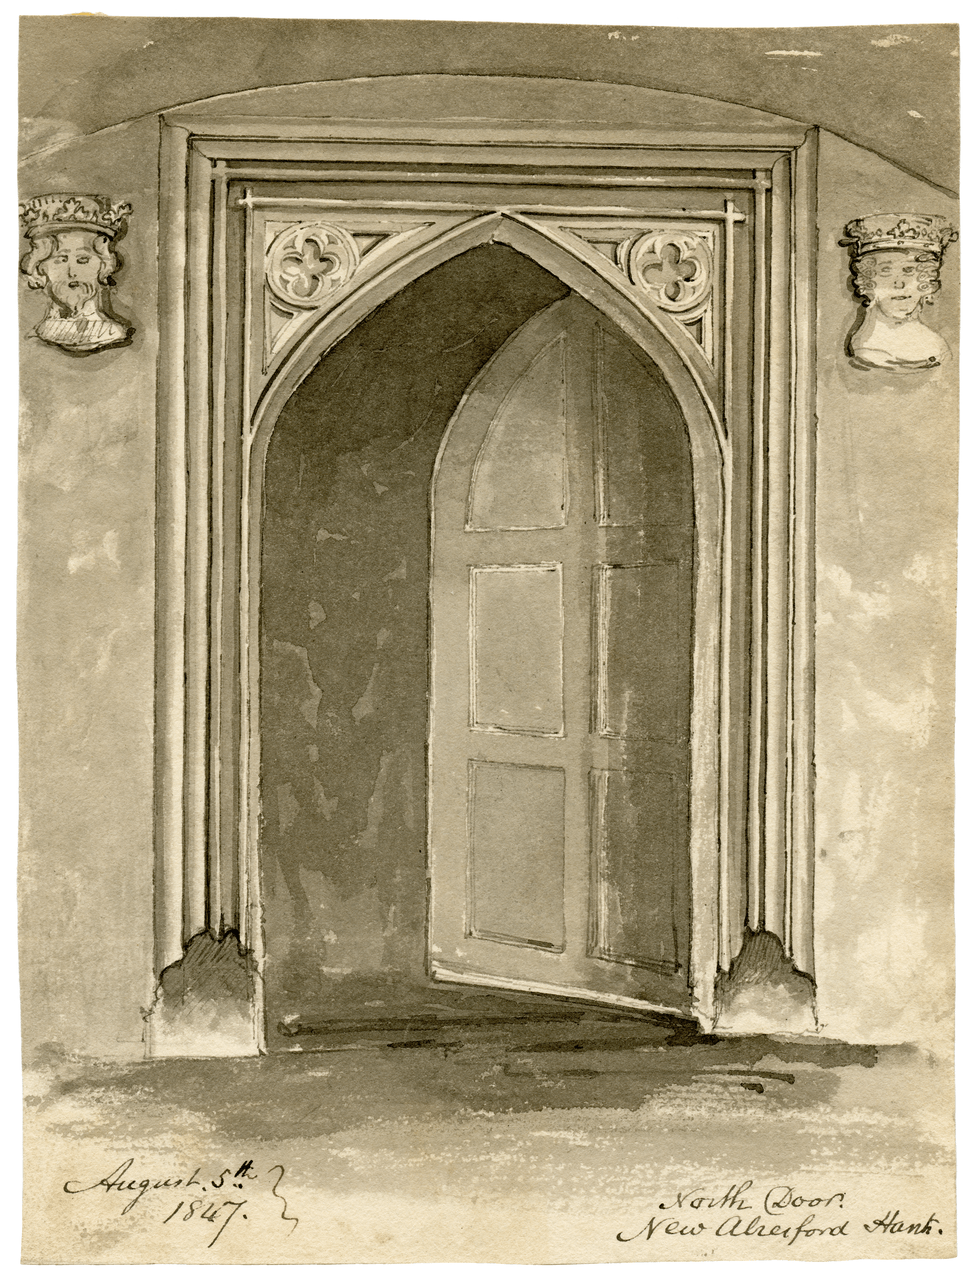 Antique British Architectural Drawing August 5th 1847 North Door New Alresford